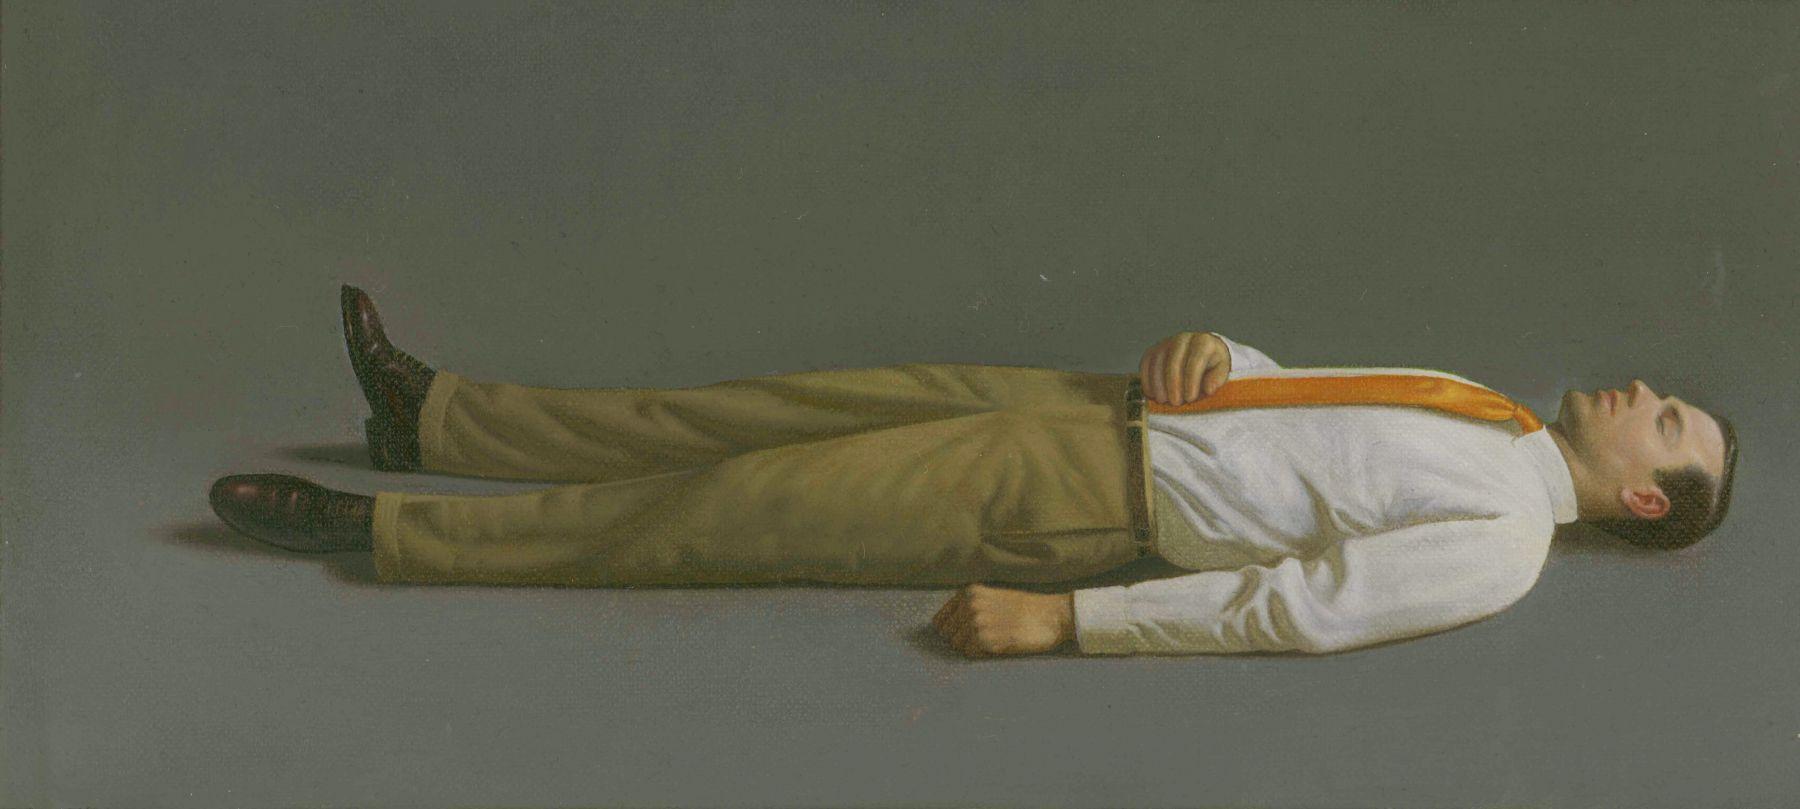 Kurt Kauper at Fredericks & Freiser